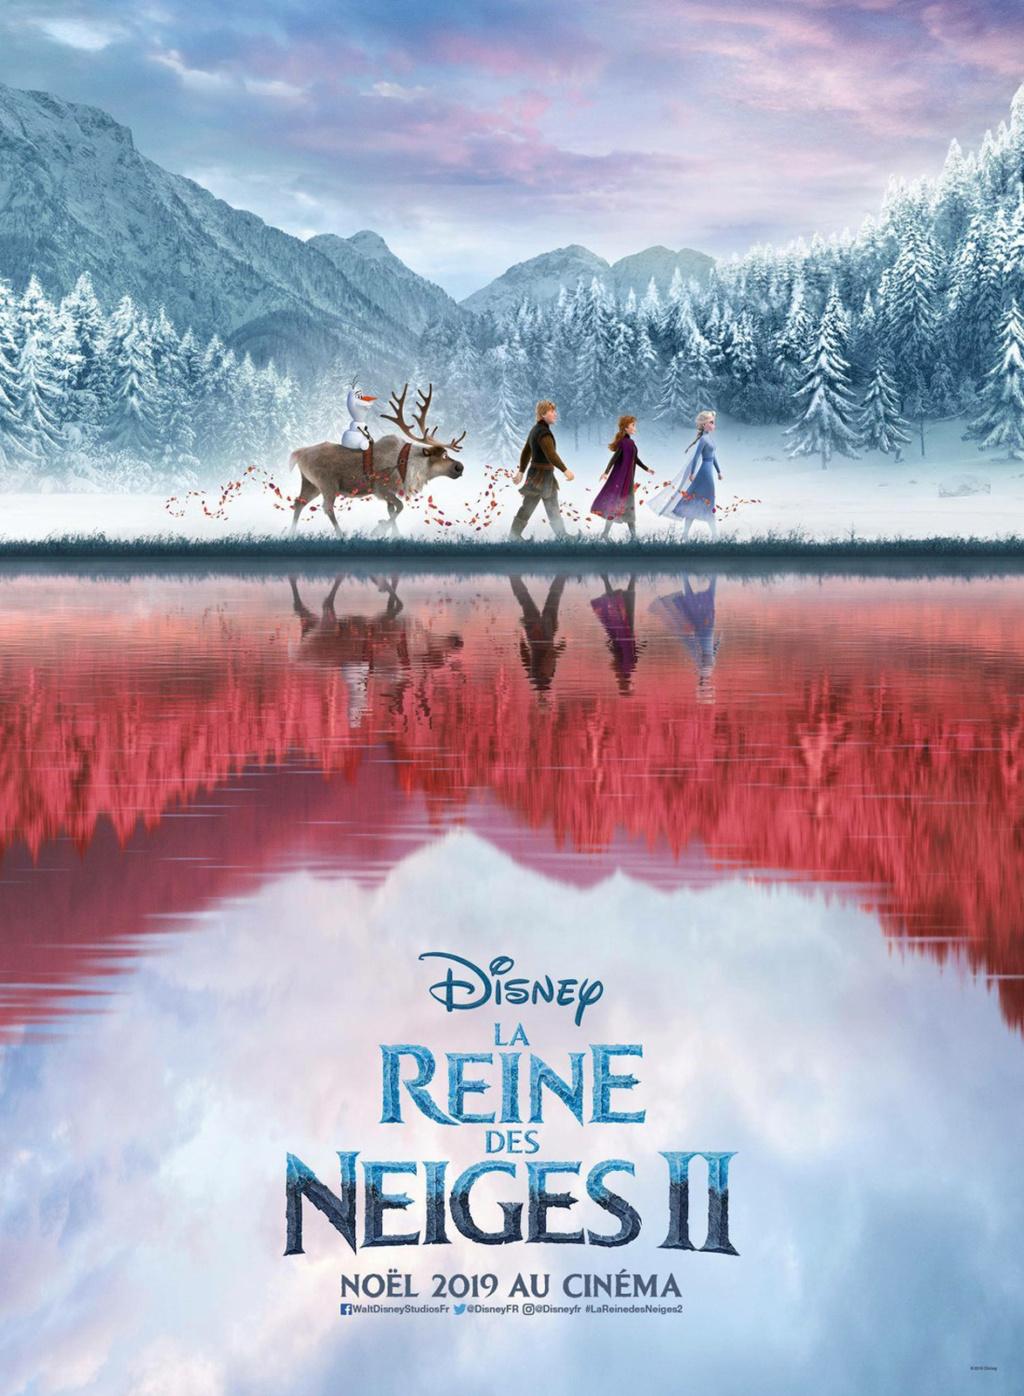 La Reine des Neiges II [Walt Disney - 2019] - Page 21 23835610